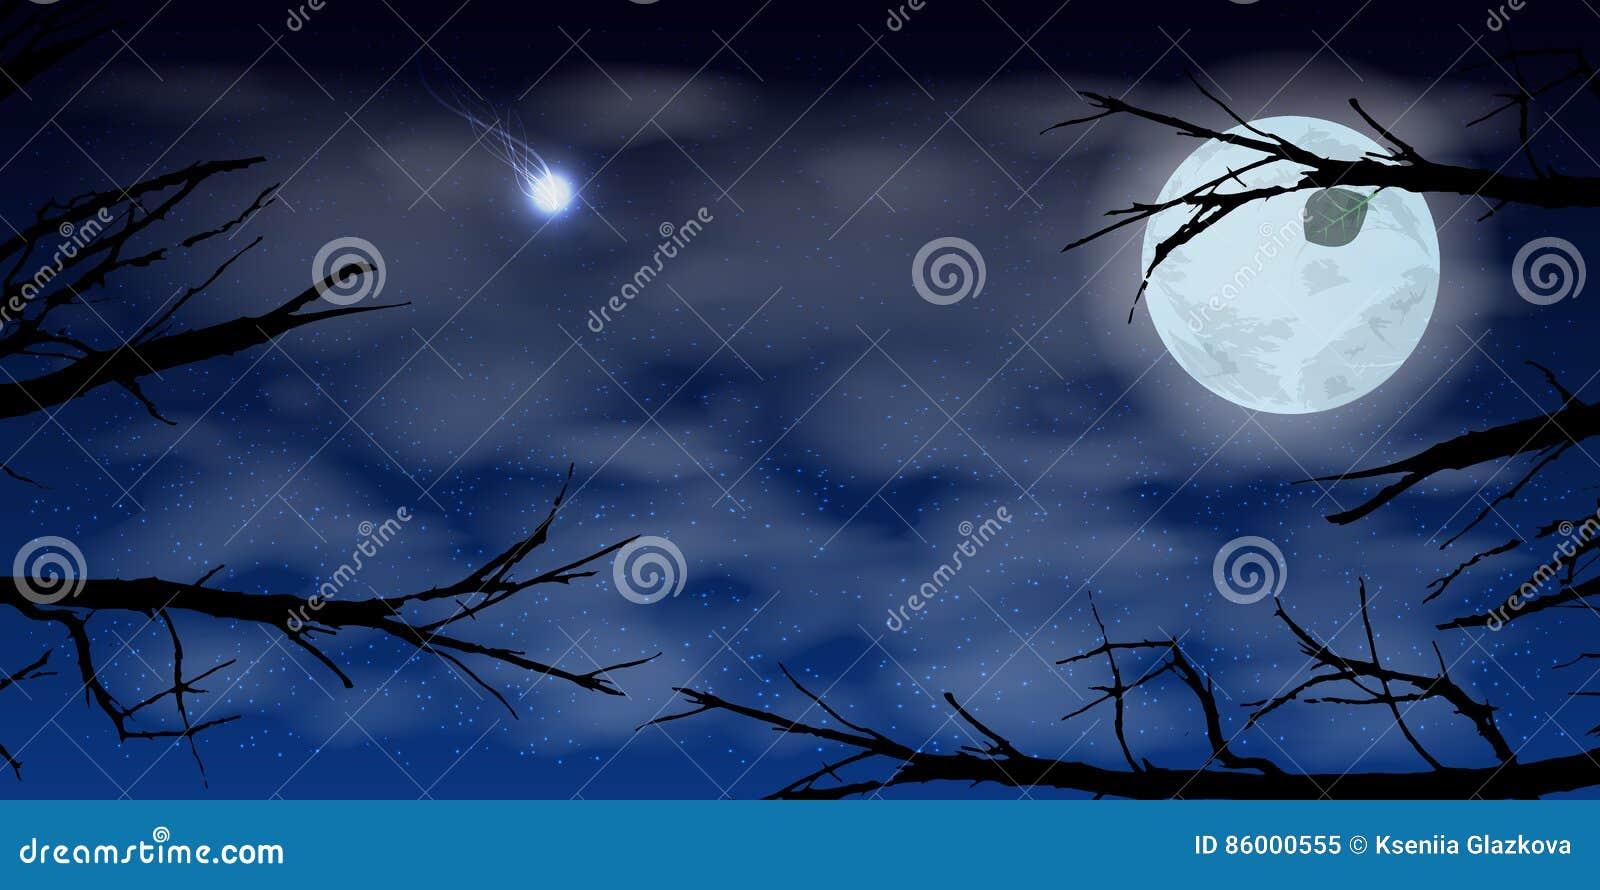 sky moon night clouds trees. illustration stock illustration